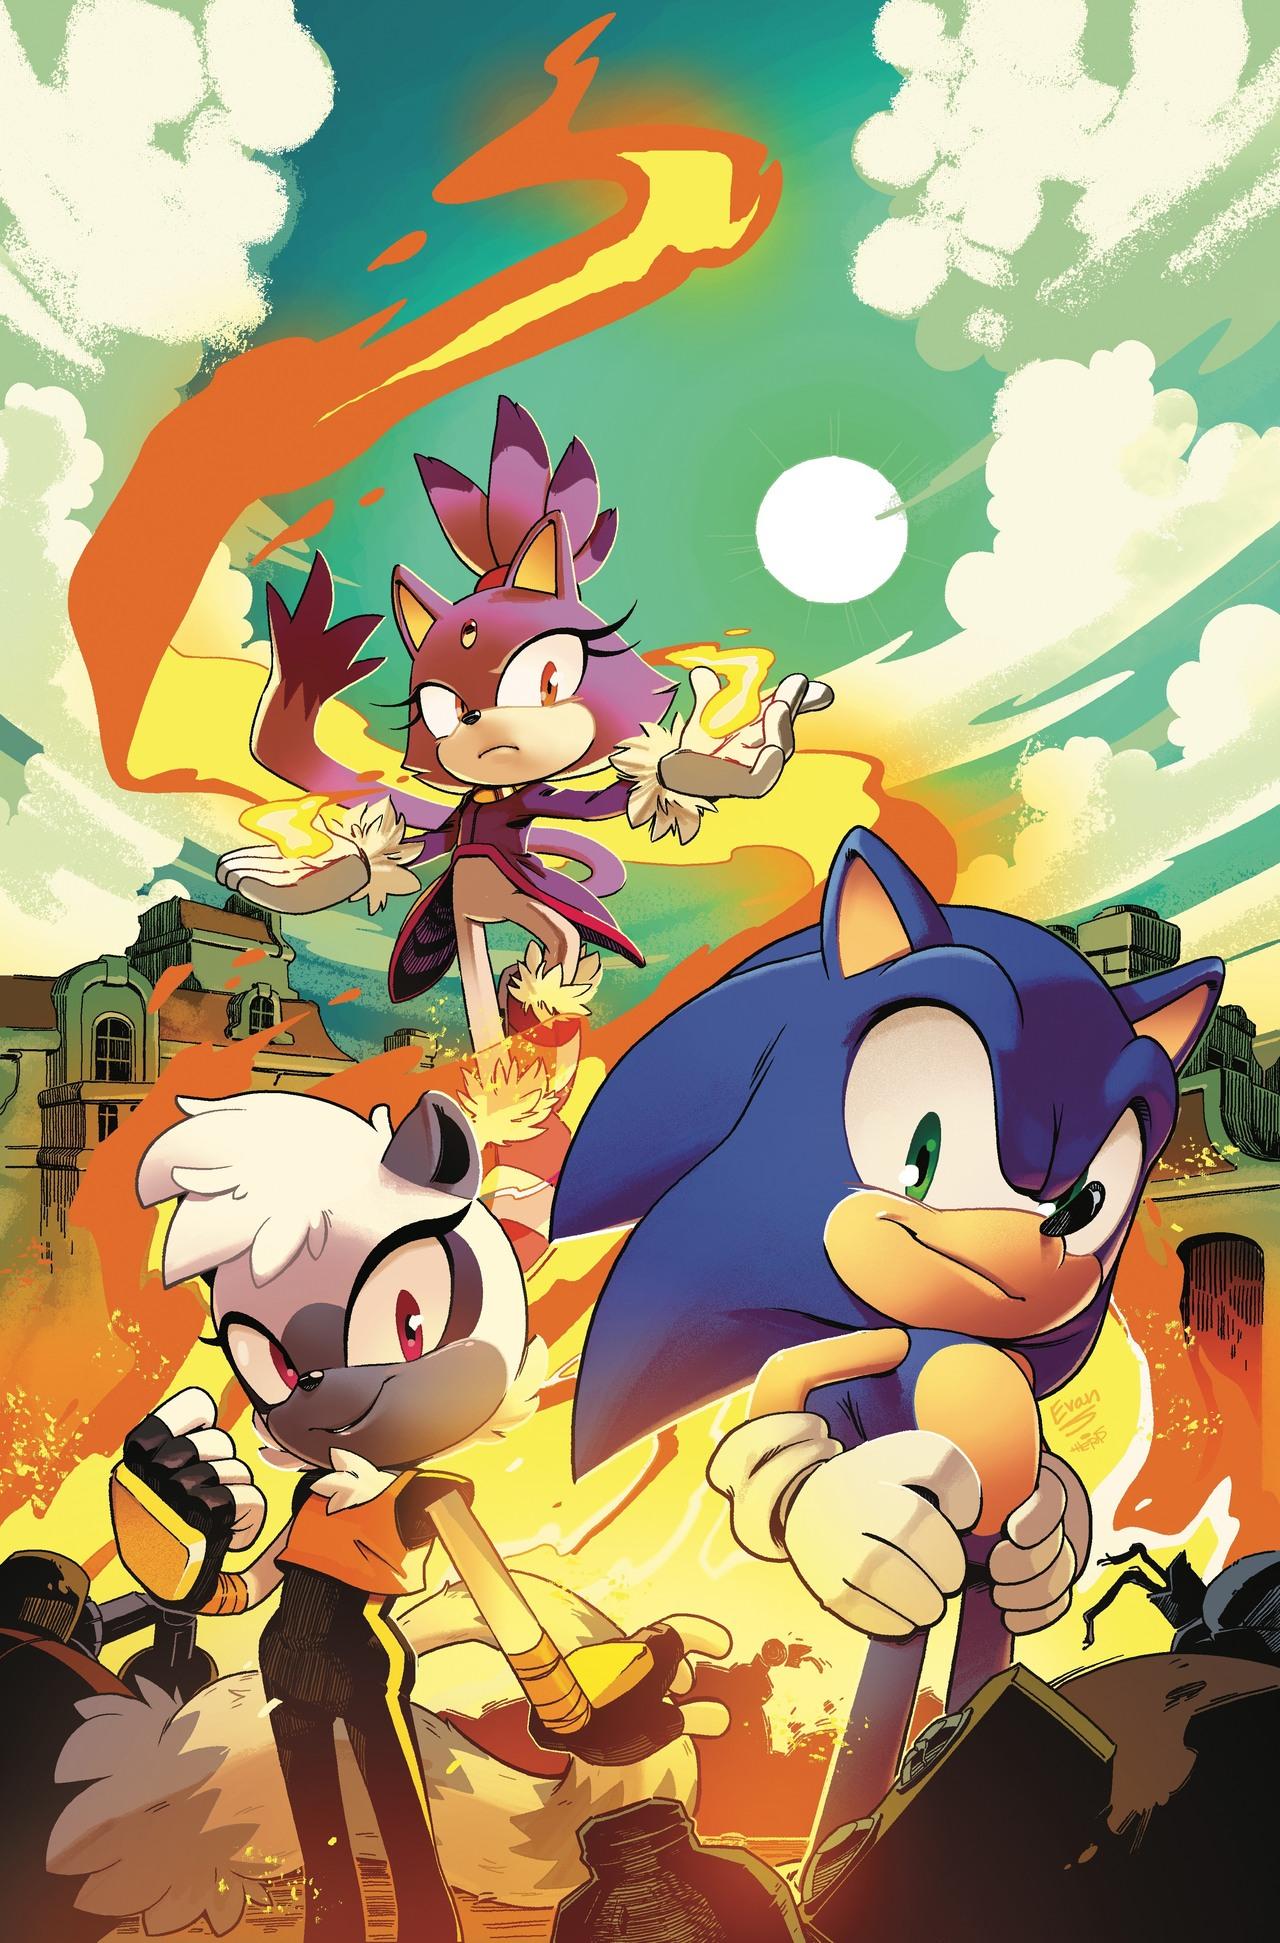 sonic the hedgehog - photo #26